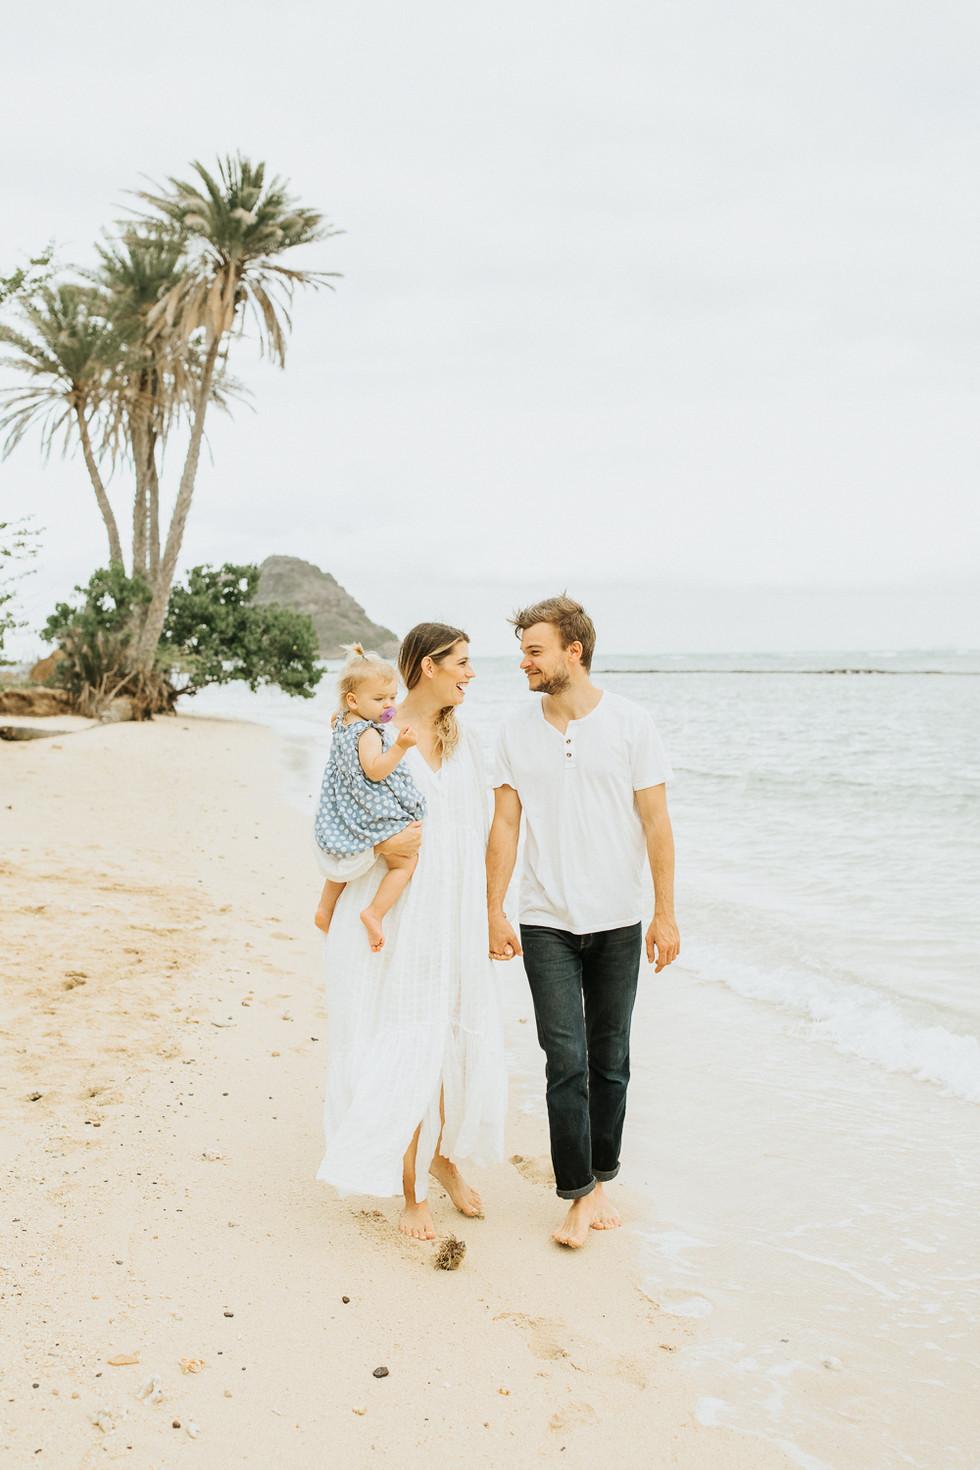 Sunset Session in Kualoa | Oahu Family Photography | Marissa HB Photography - Hawaii